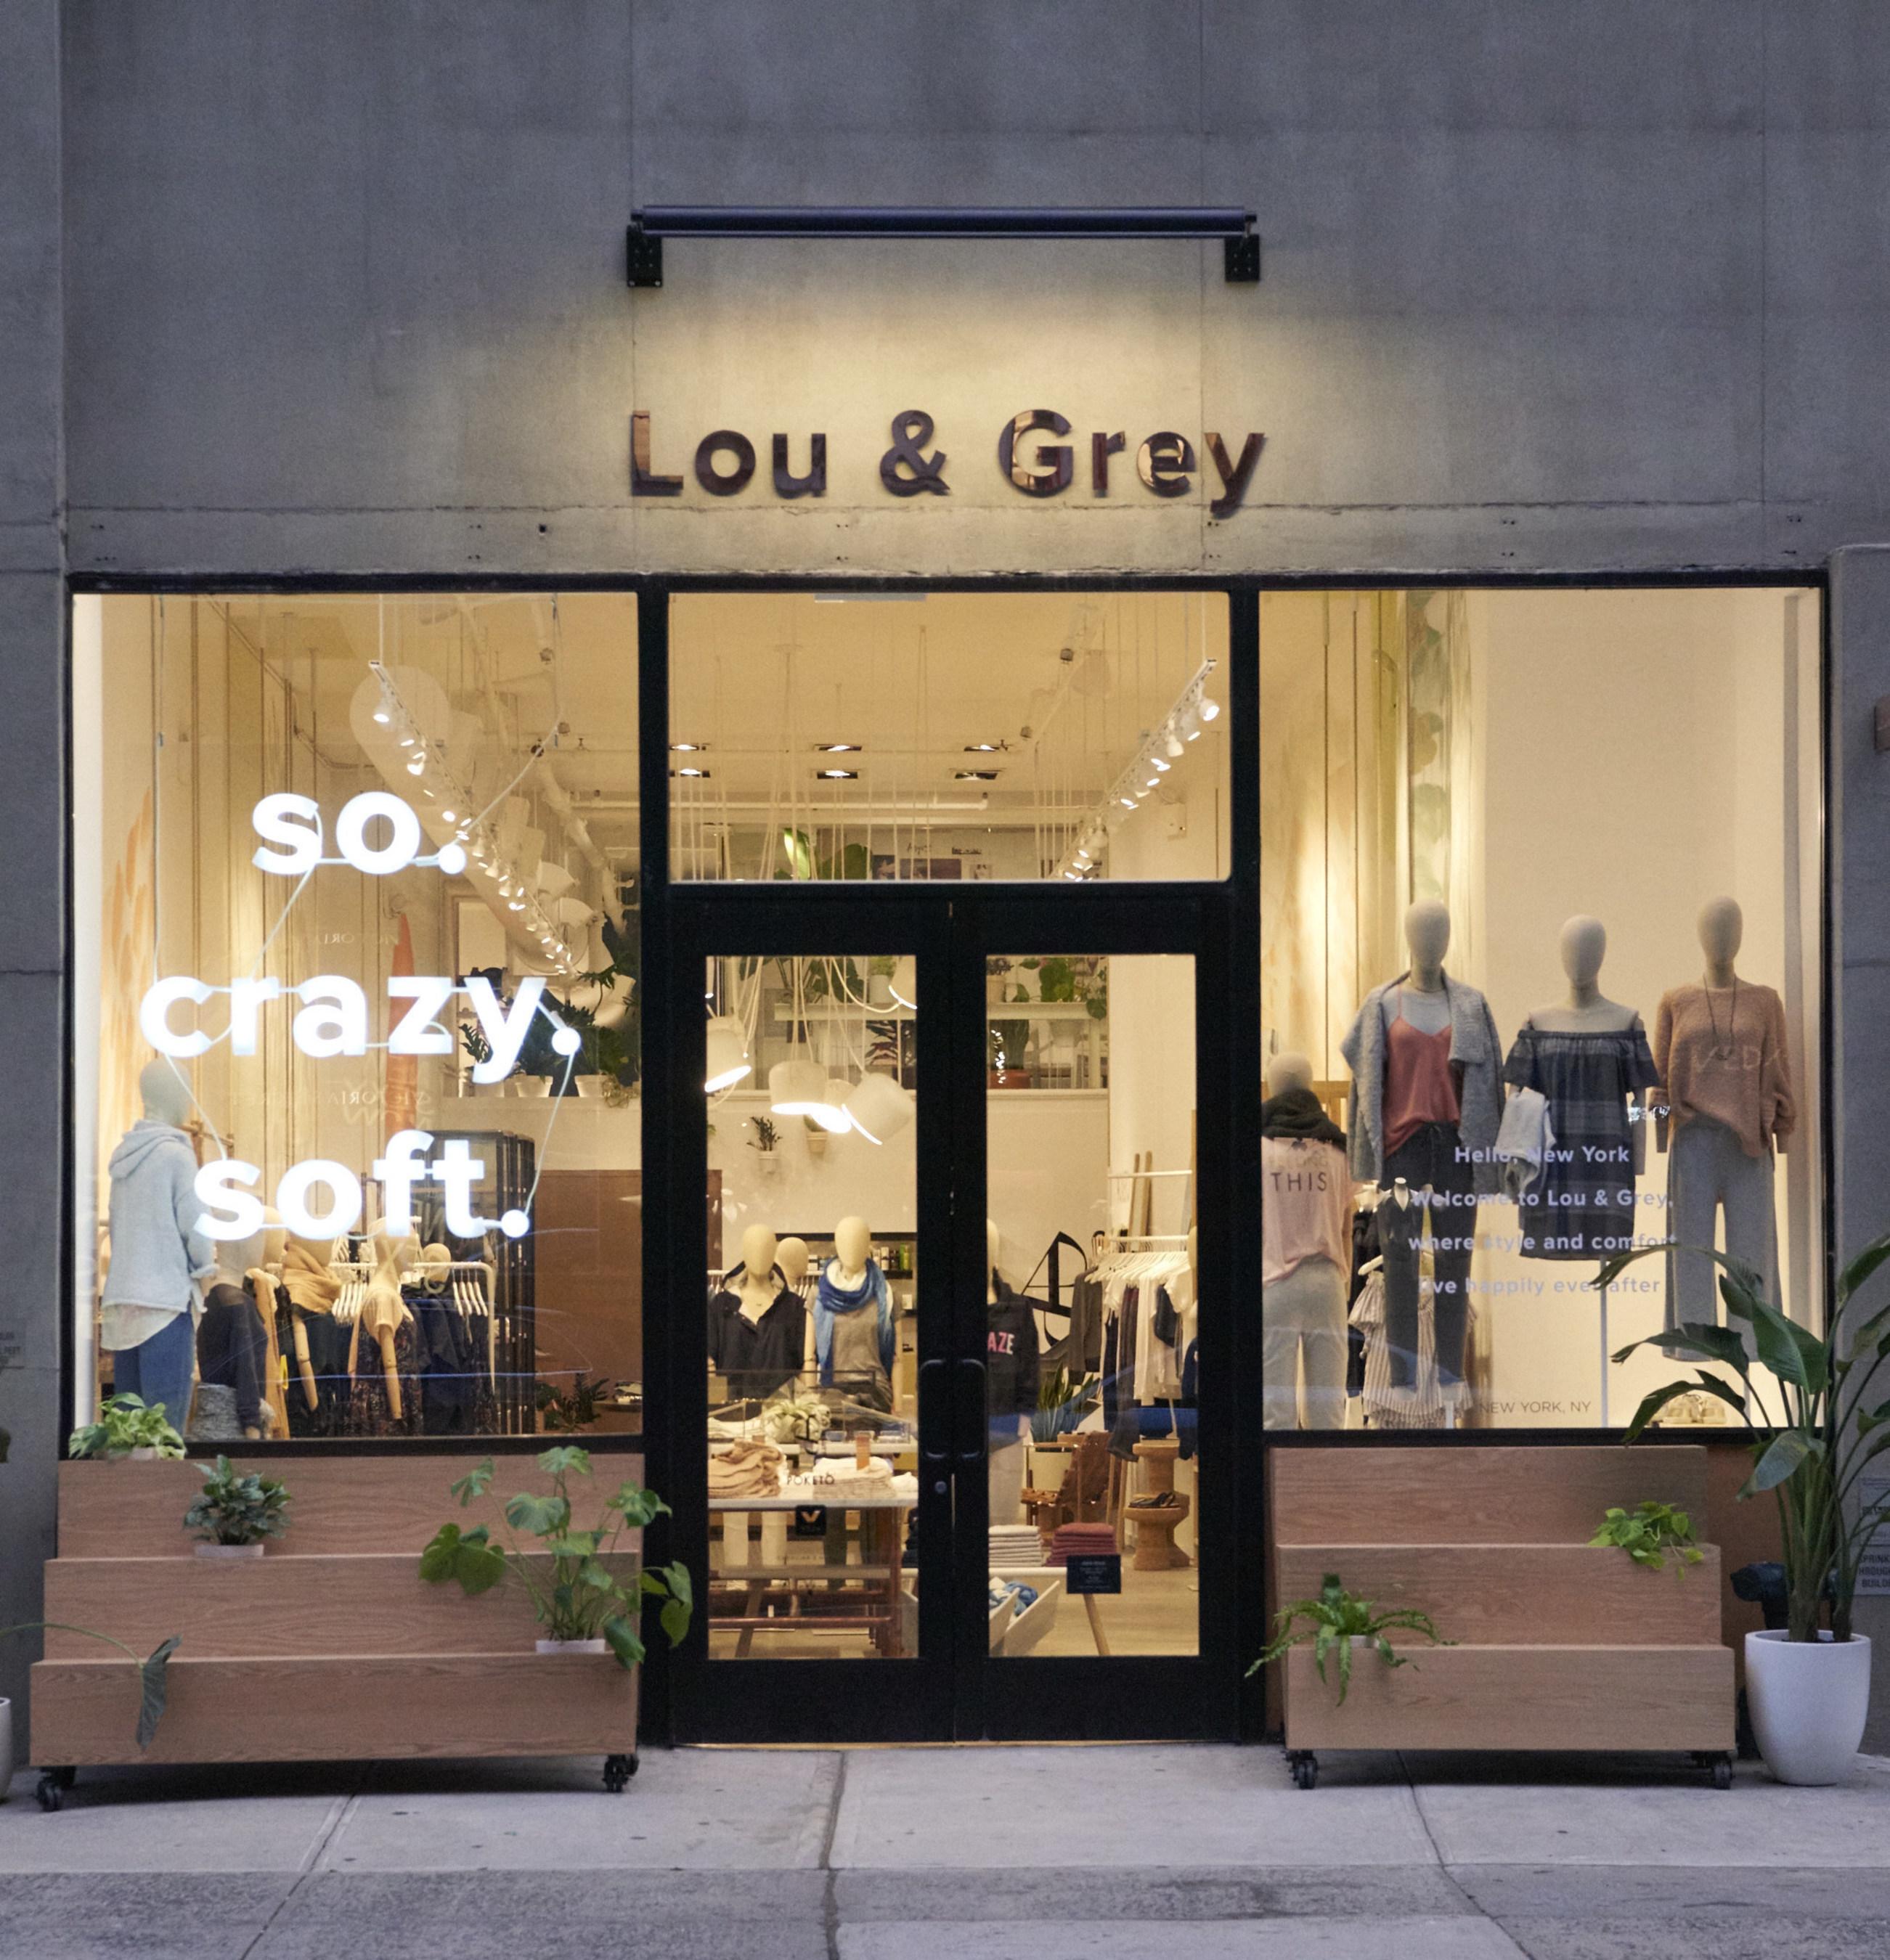 Lou & Grey Flatiron storefront